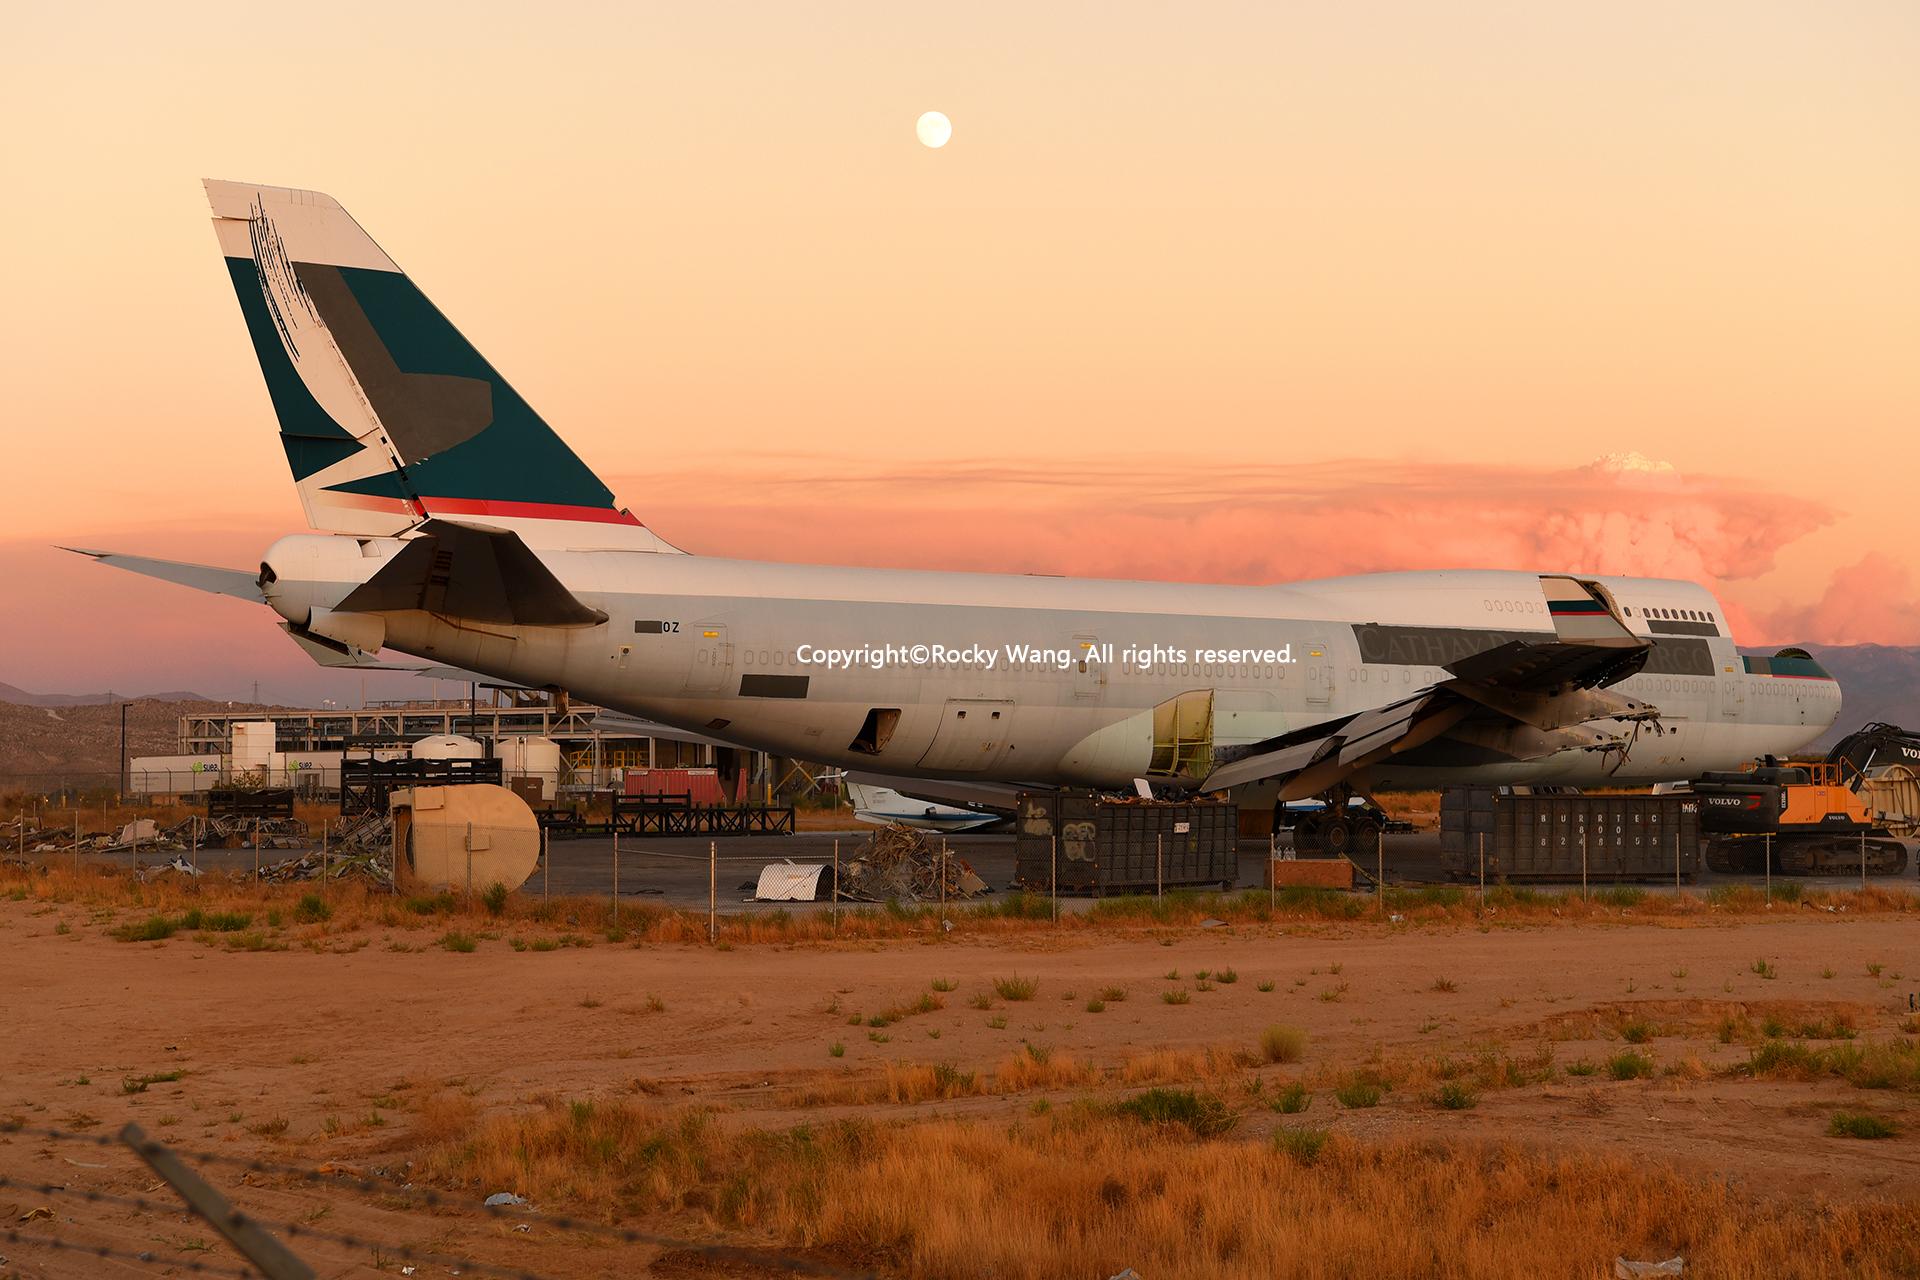 Re:[原创]沙漠29图+彩蛋 BOEING 747-467(BCF) B-HOZ Victorville-Southern California Logistic